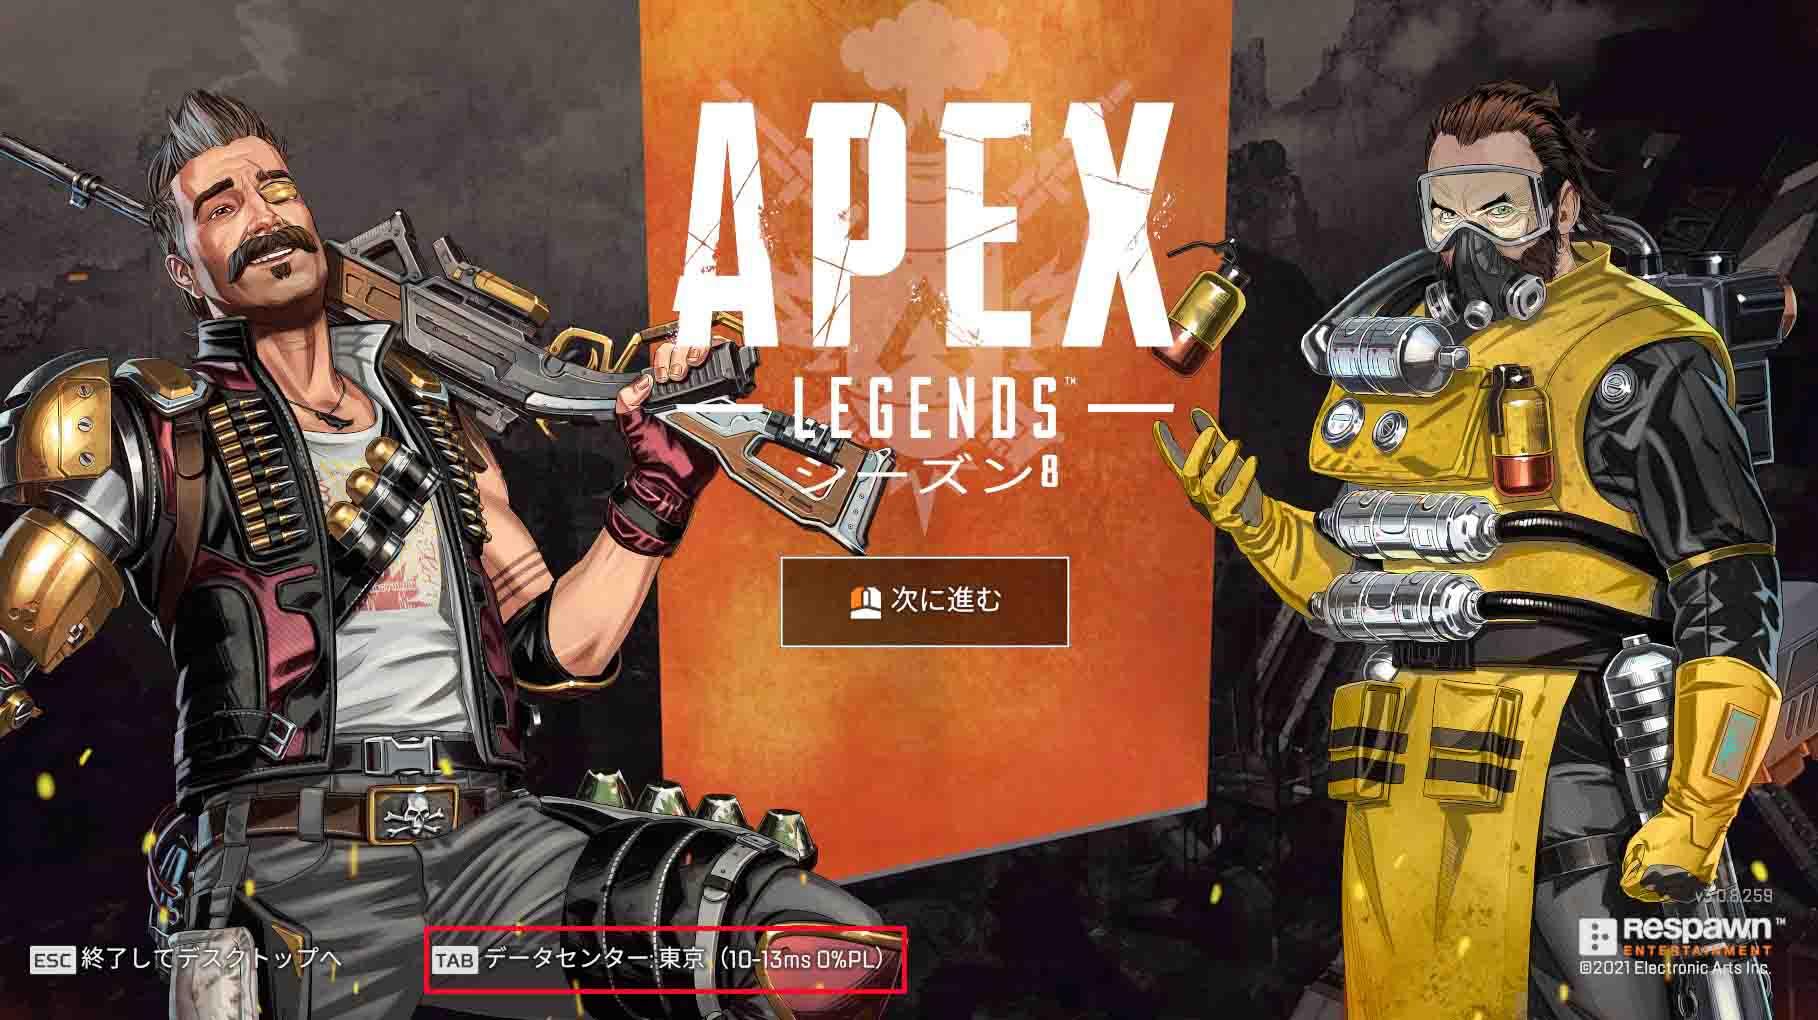 【Apex Legends】ゲームの起動中にメインメニューへと戻り、接続サーバーを変更する方法